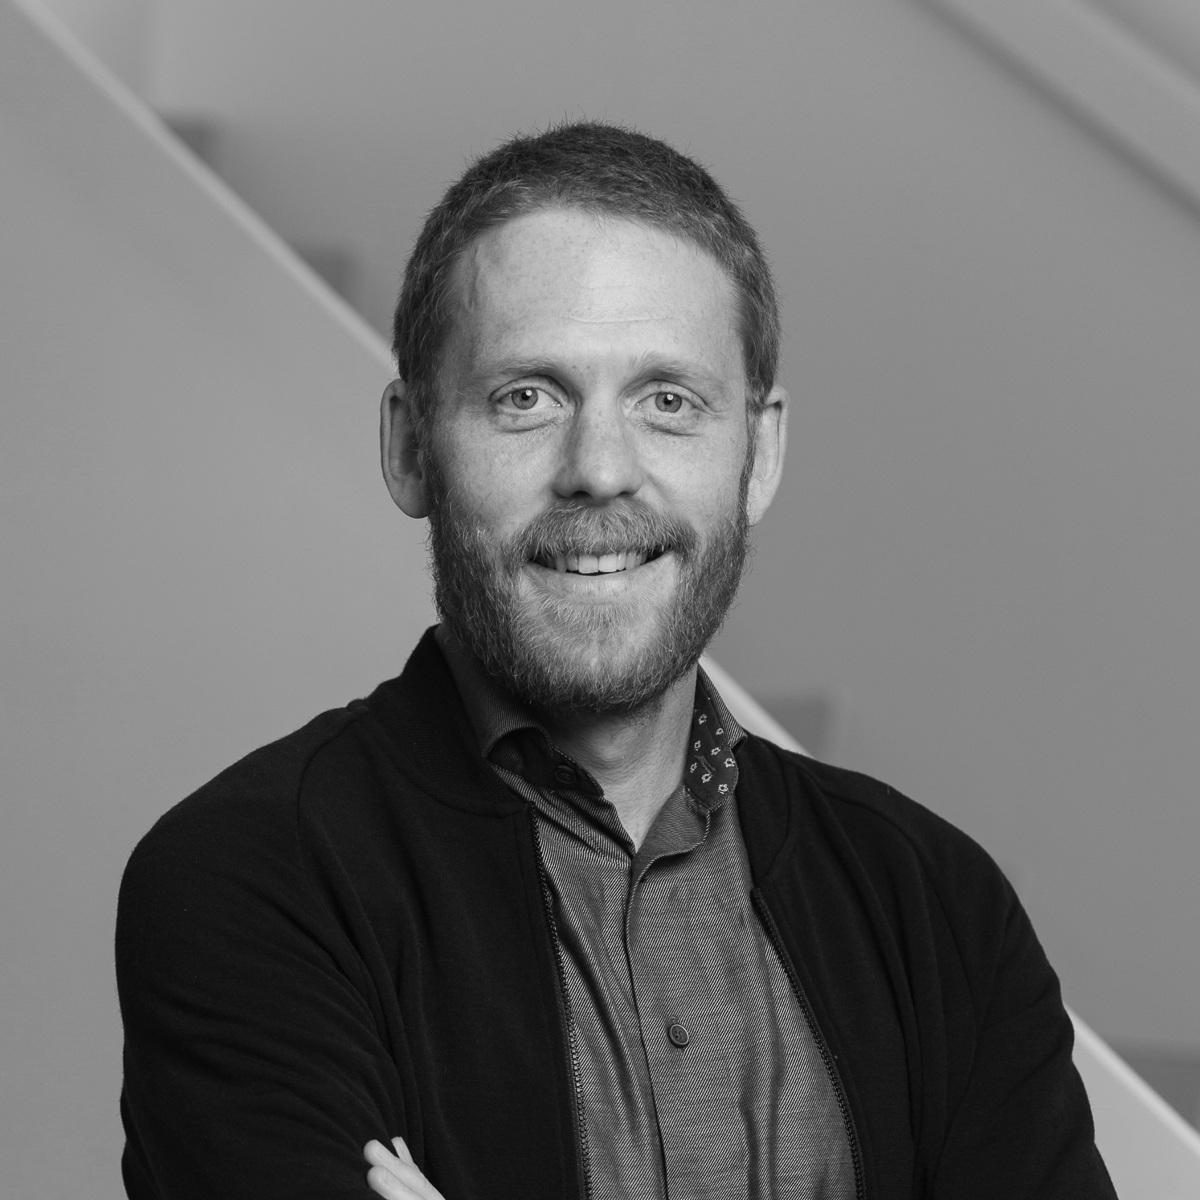 Paul Behrens